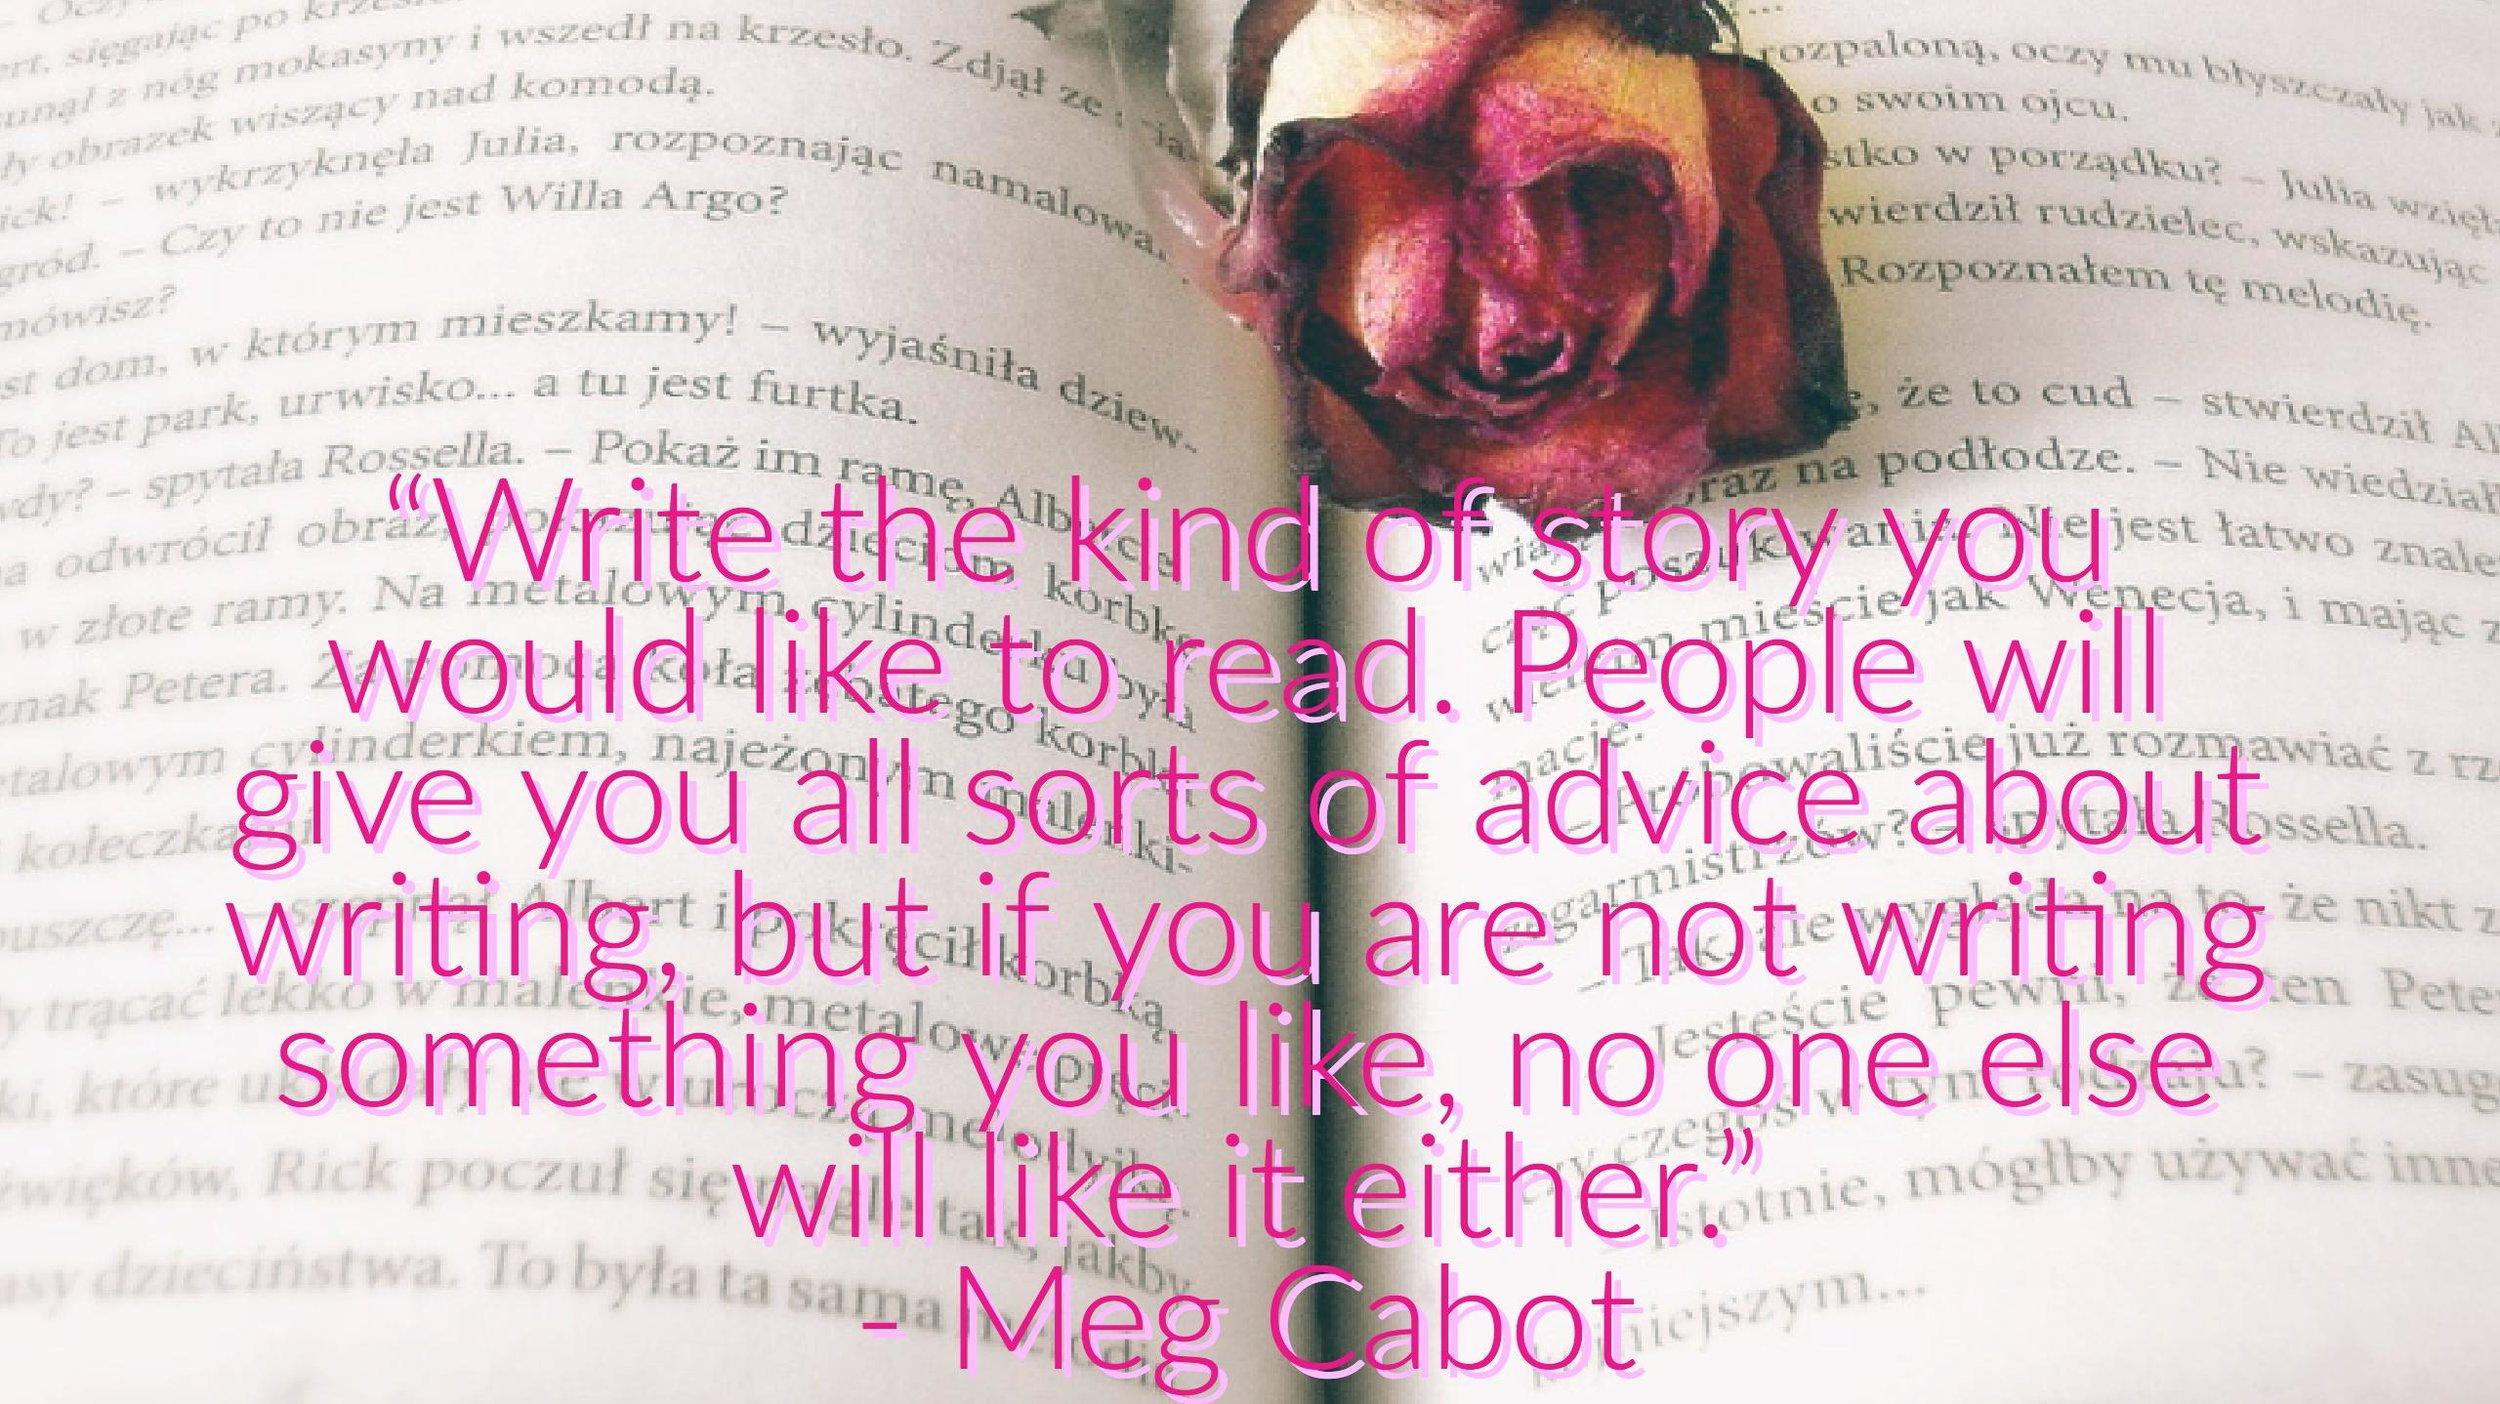 meg cabot quote.jpg